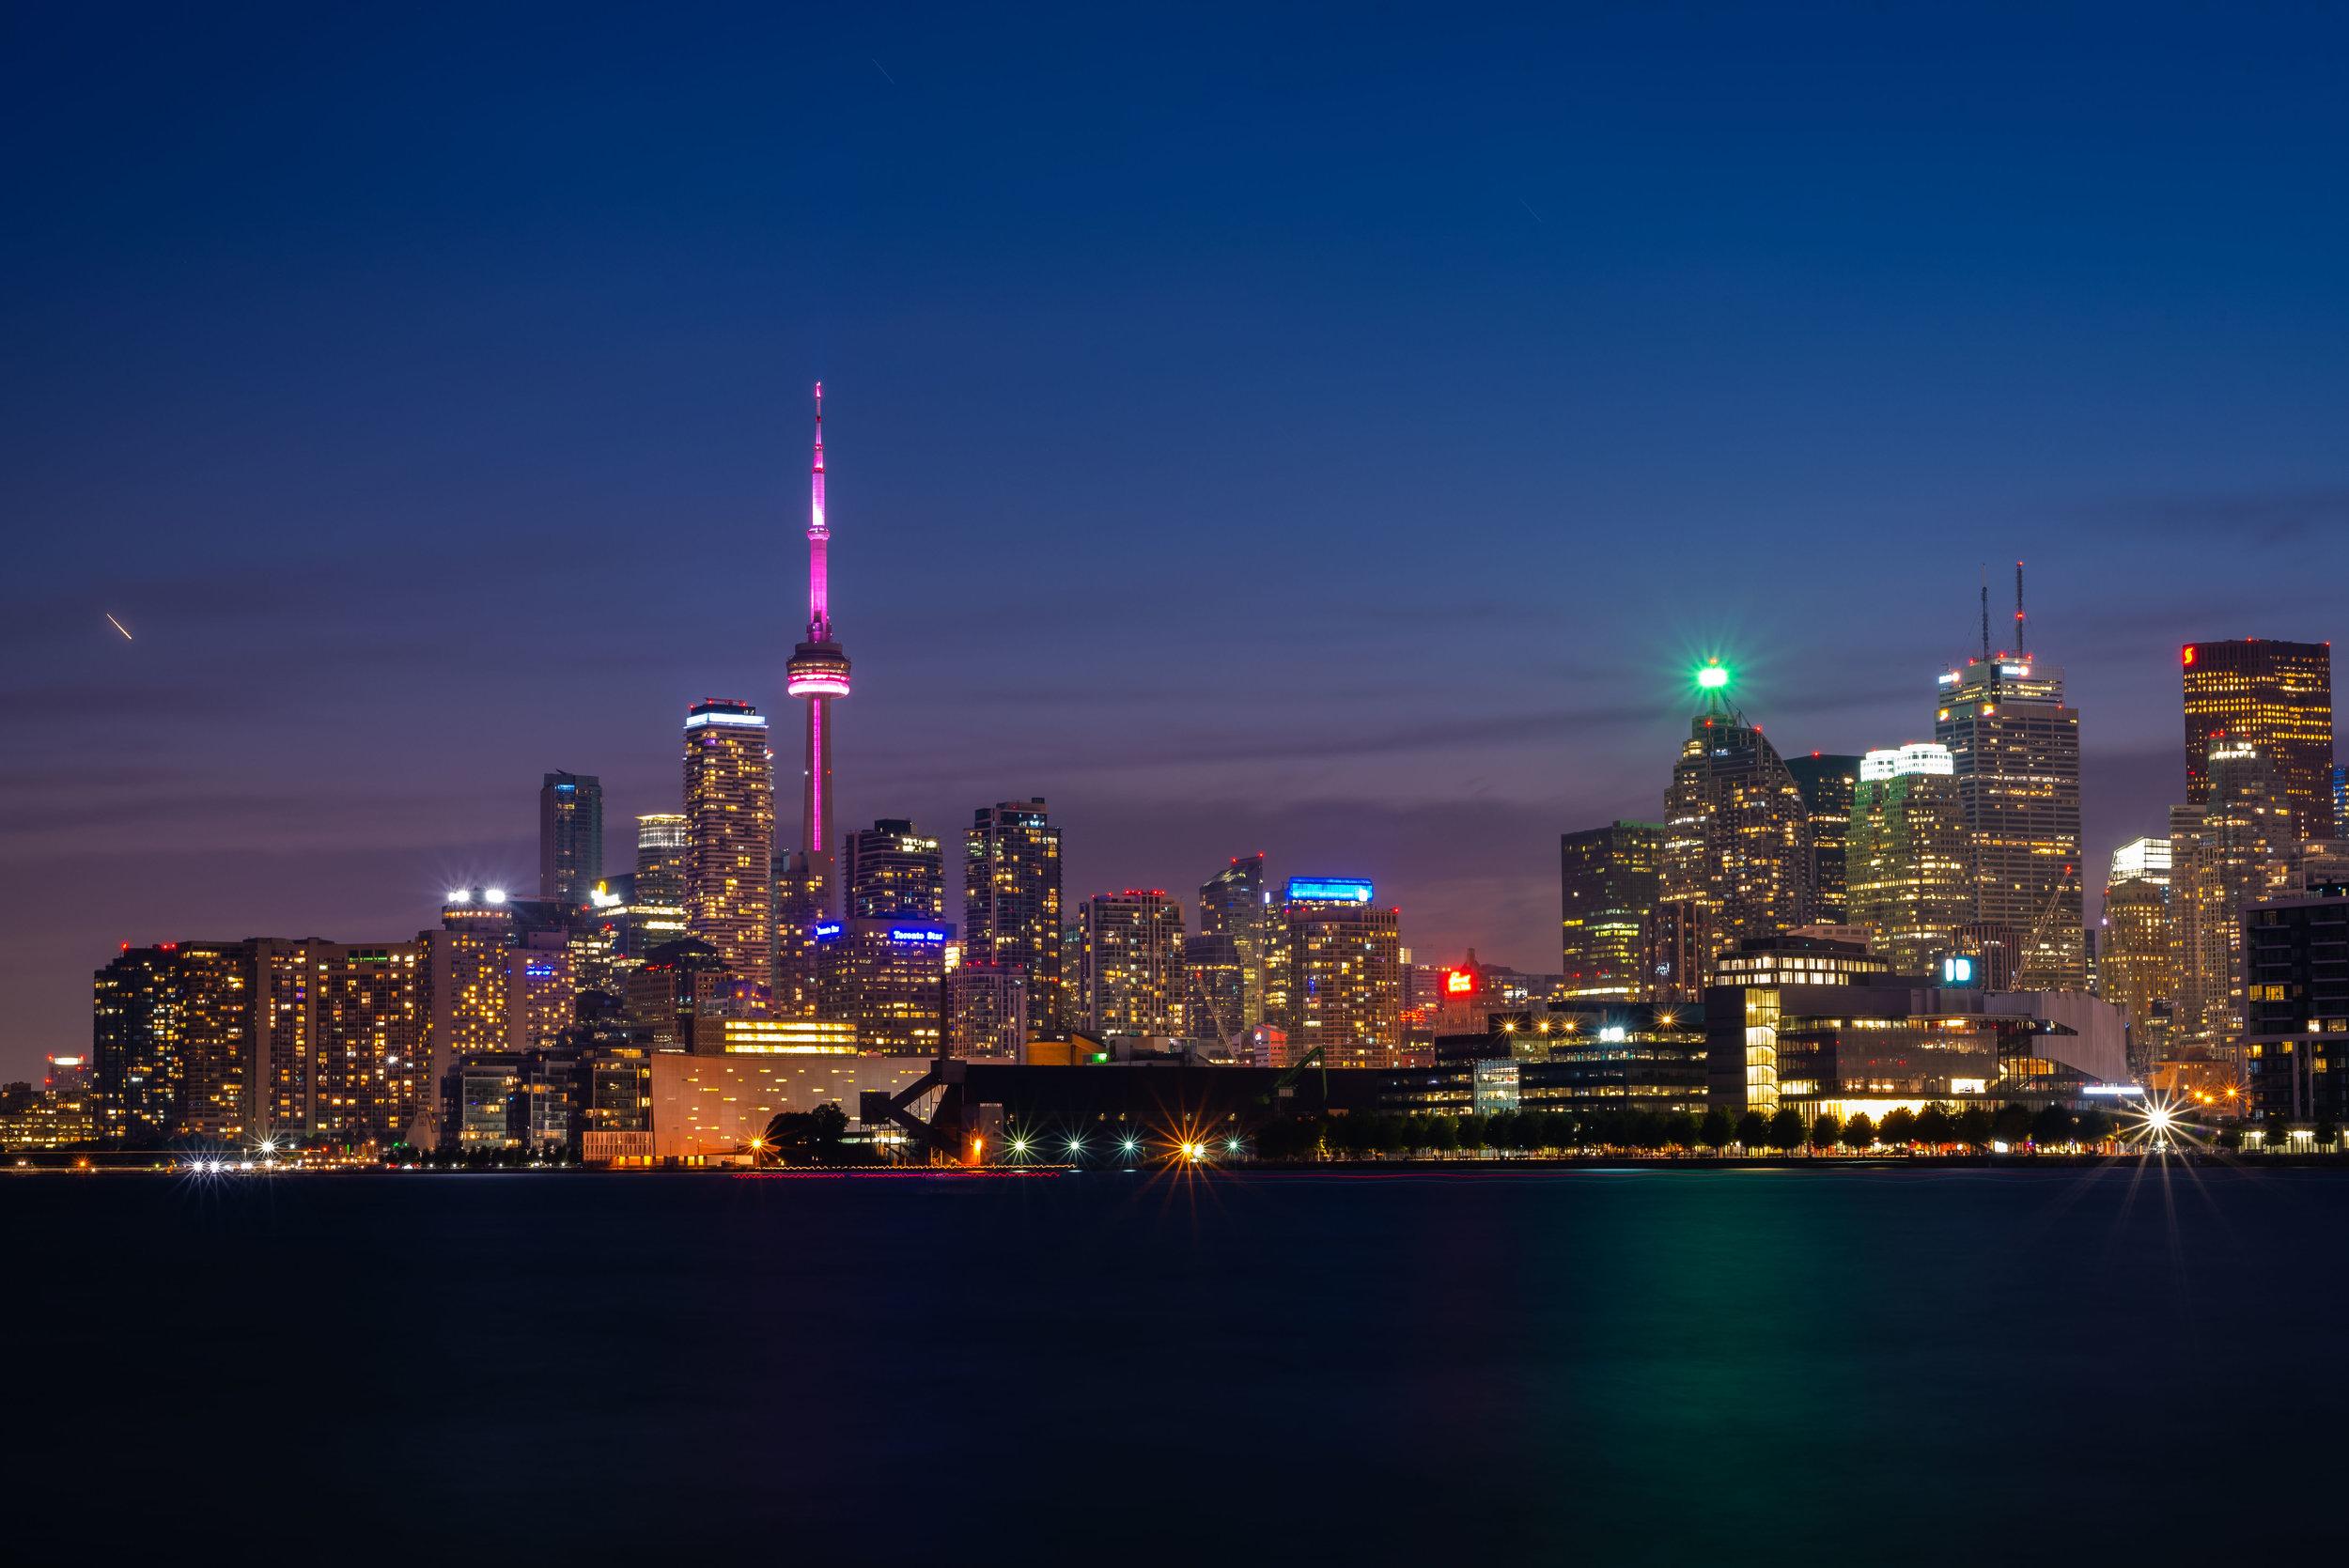 Toronto - Ontario